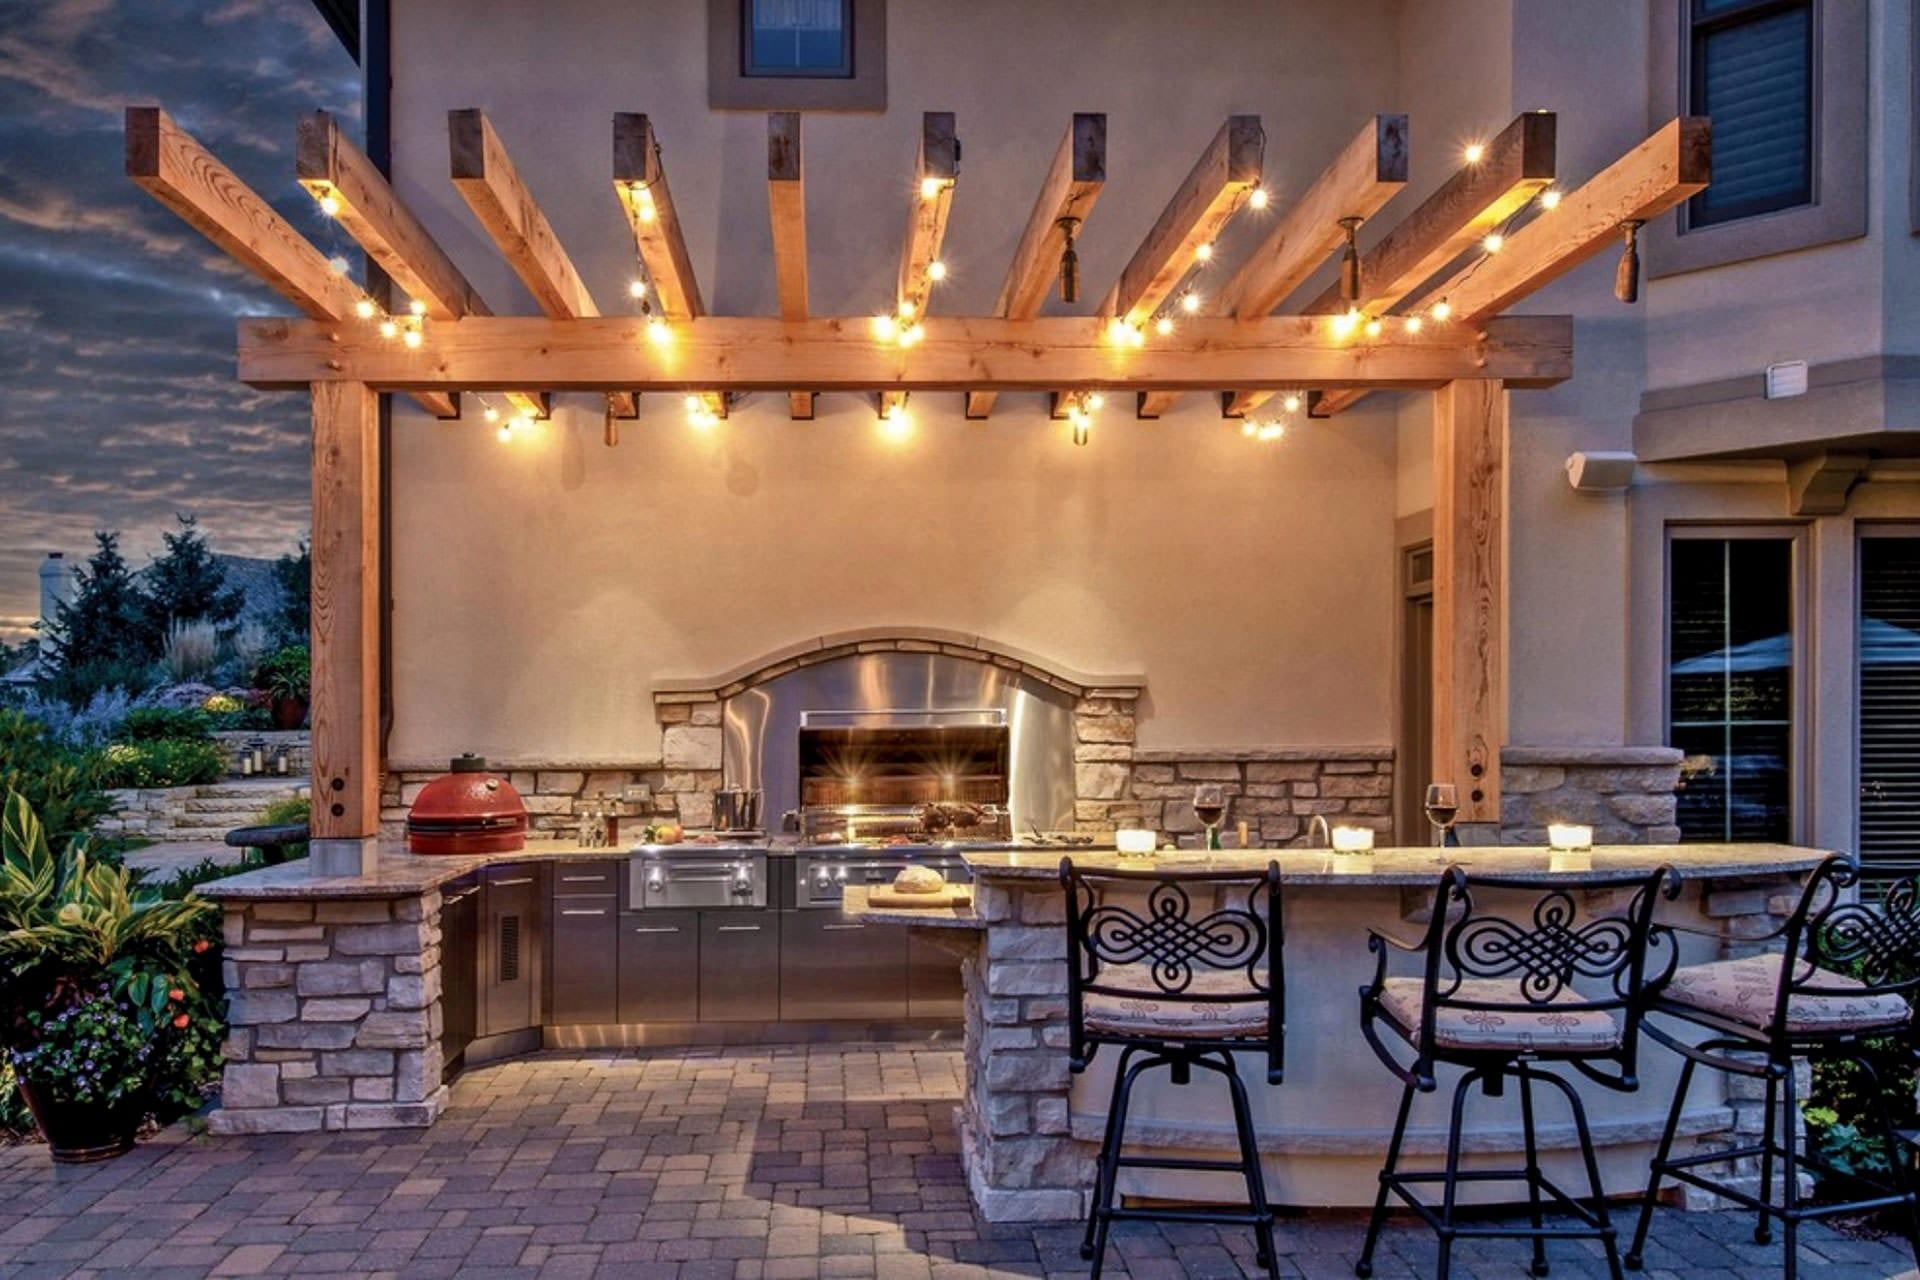 1 nett-outdoor-kitchen-lights-lighting-design-10-8319 - Grill Tanks Plus